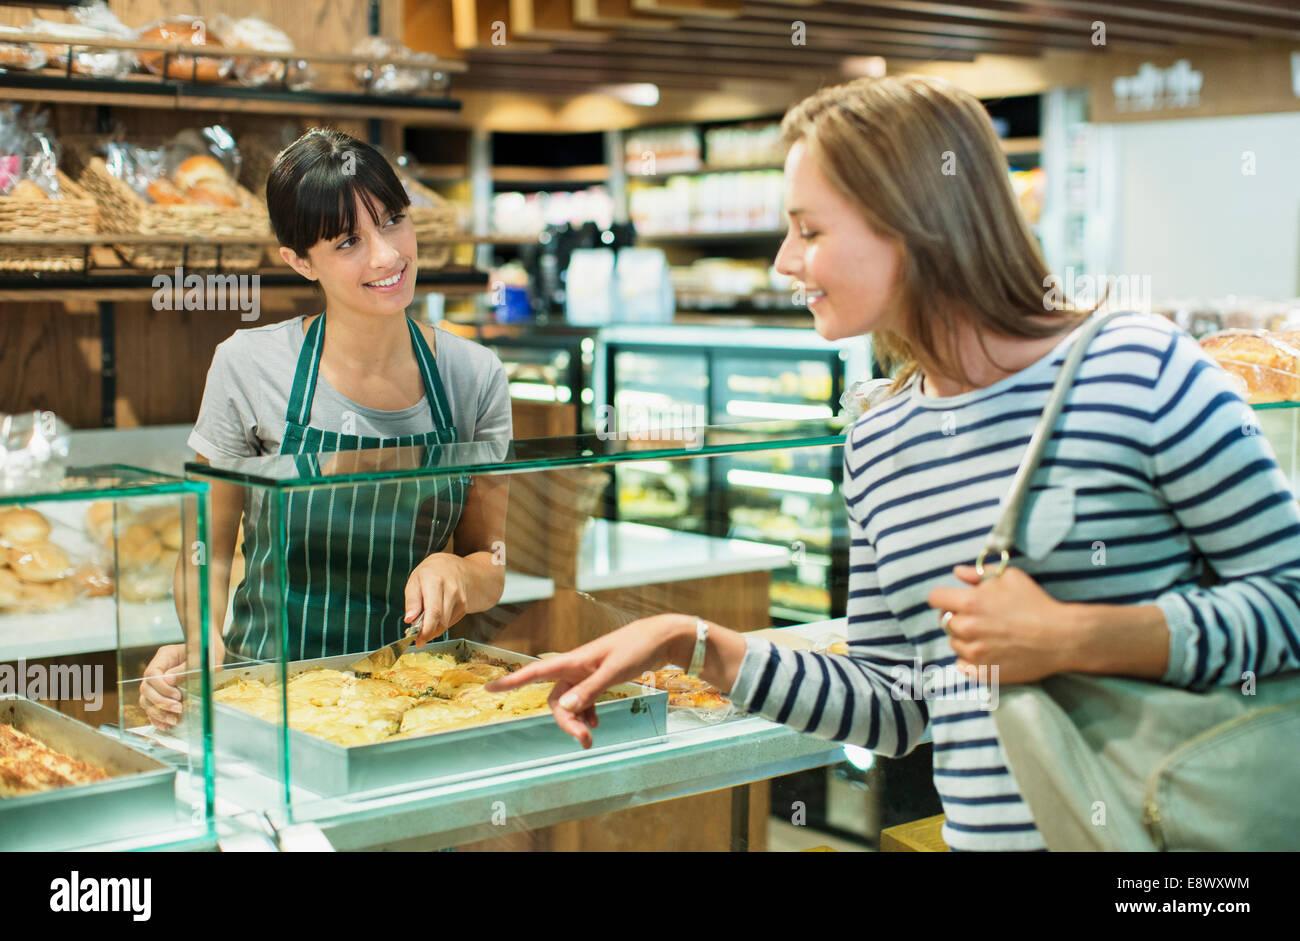 clerk serving customer at deli counter in grocery store stock clerk serving customer at deli counter in grocery store